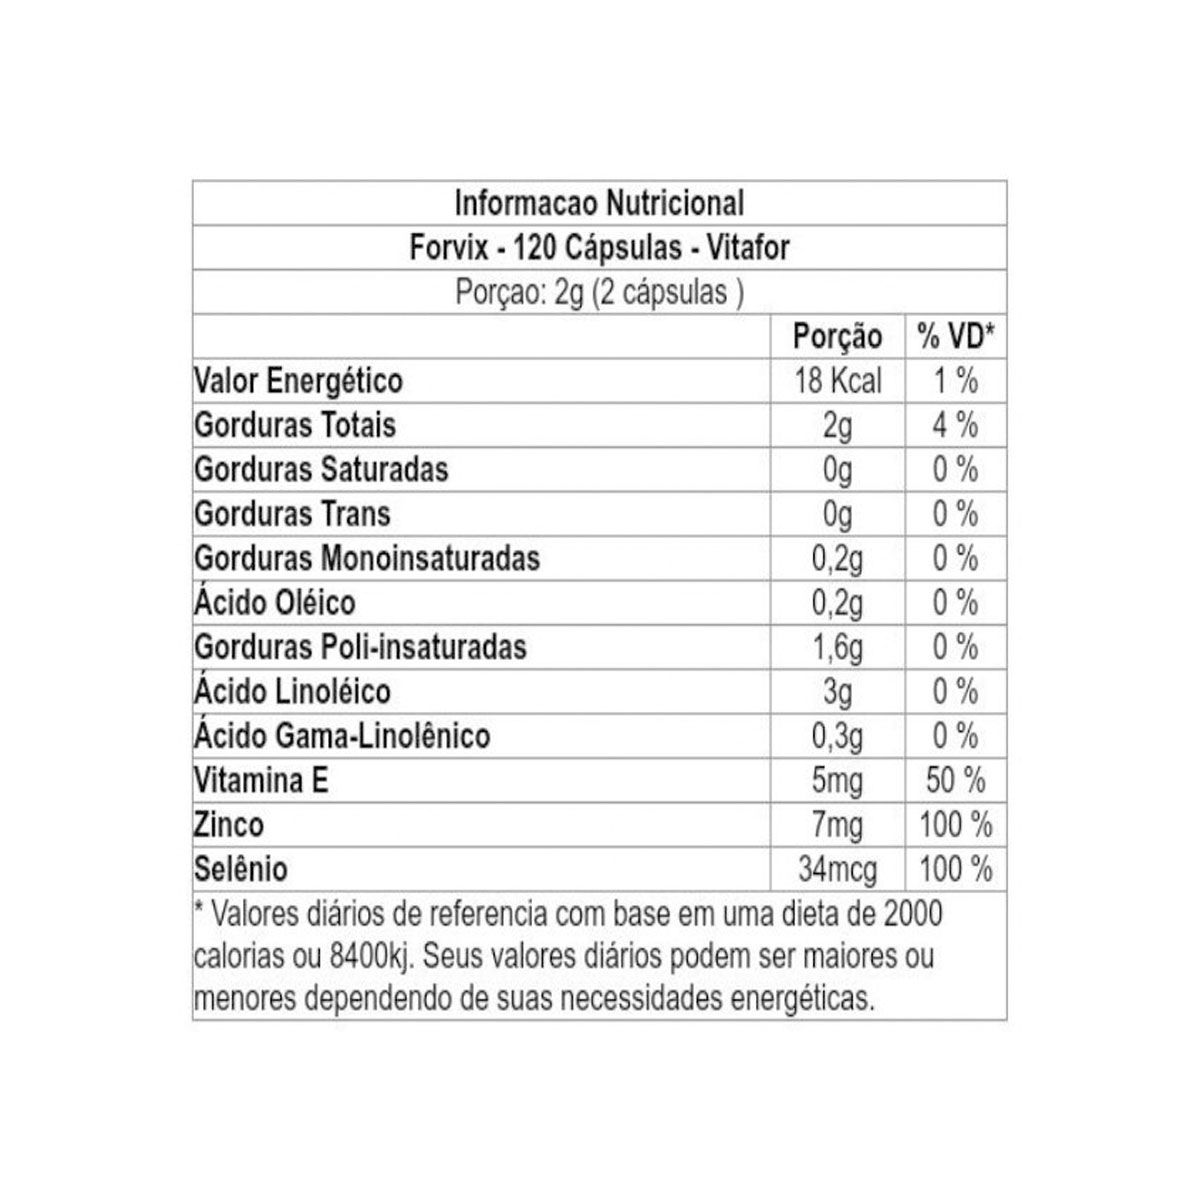 Forvix 120 cápsulas - Vitafor